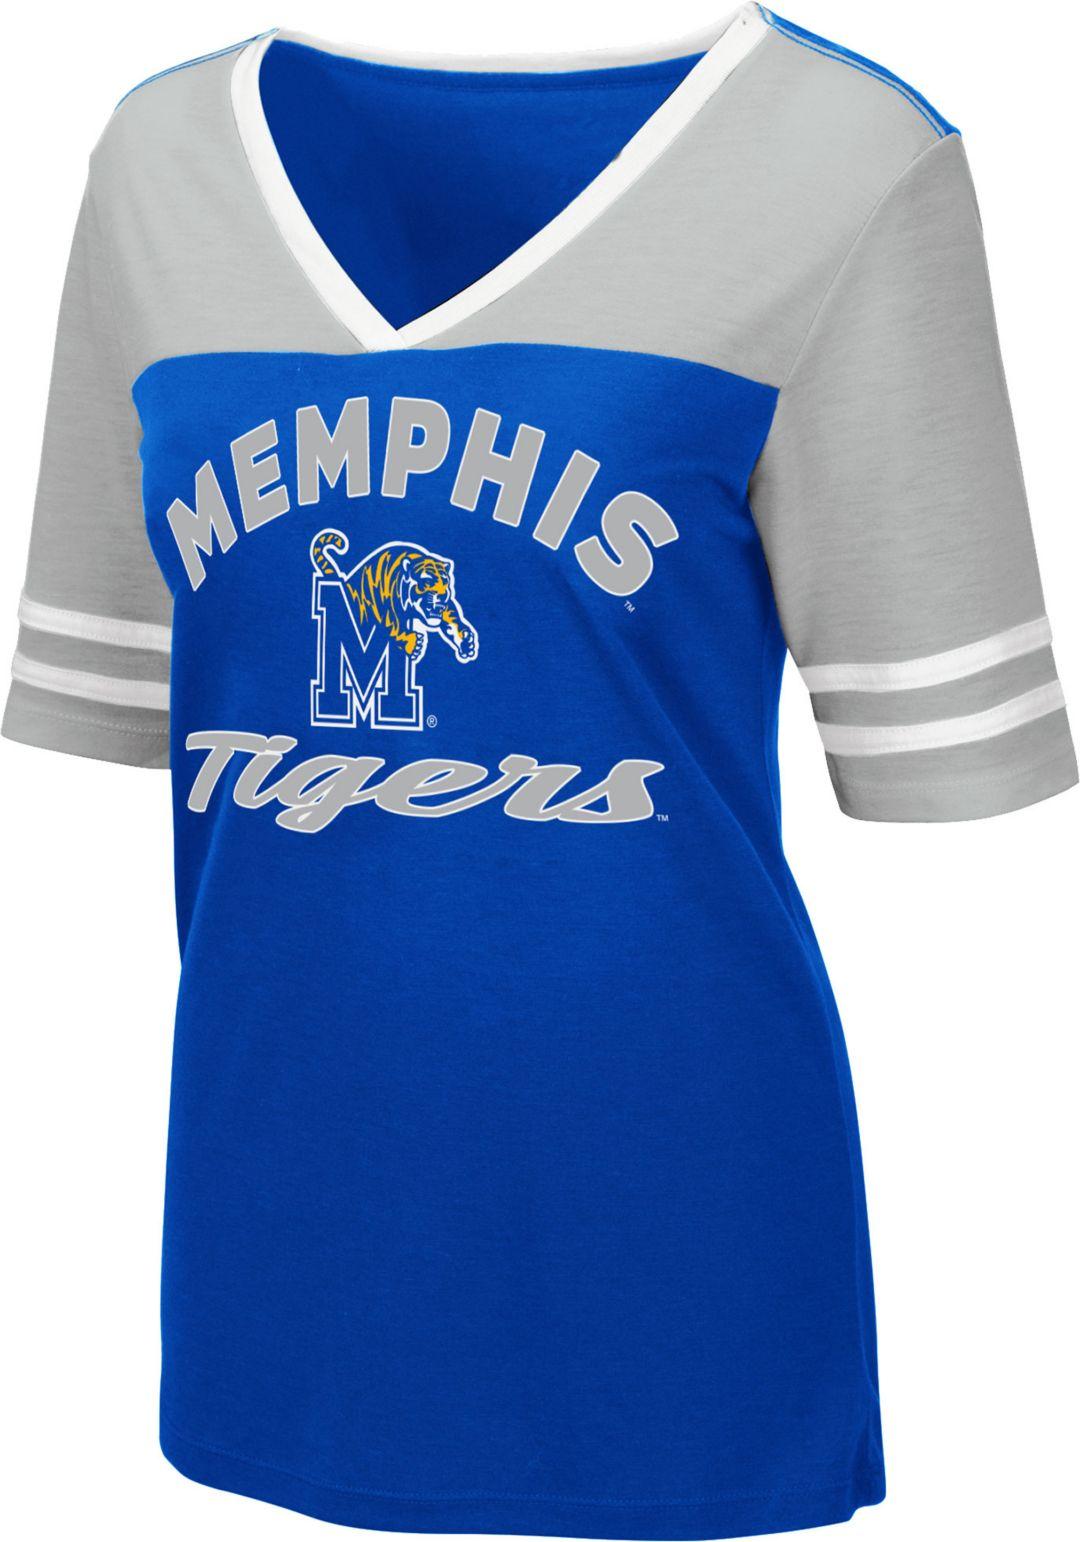 info for fb02b 8334f Colosseum Women's Memphis Tigers Blue Samantha T-Shirt